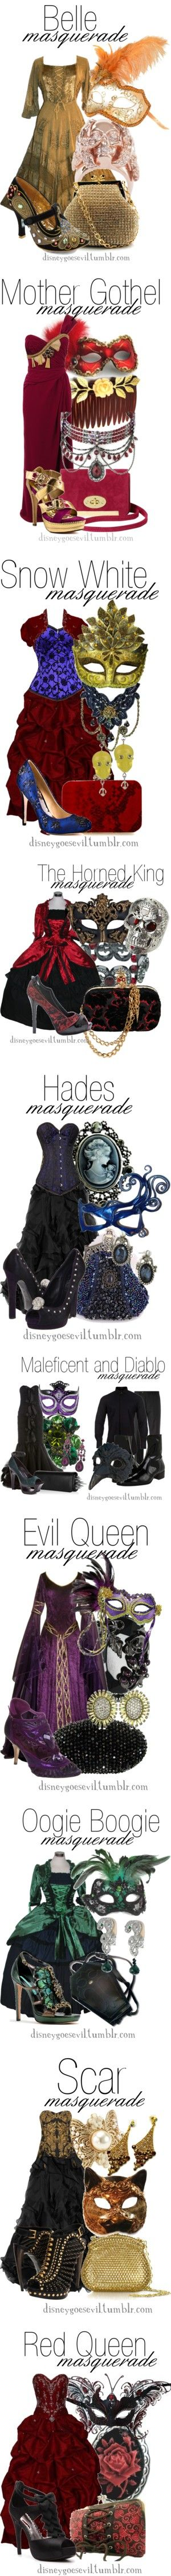 """Disney Villains Masquerade"" by disney-villains ❤ liked on Polyvore"